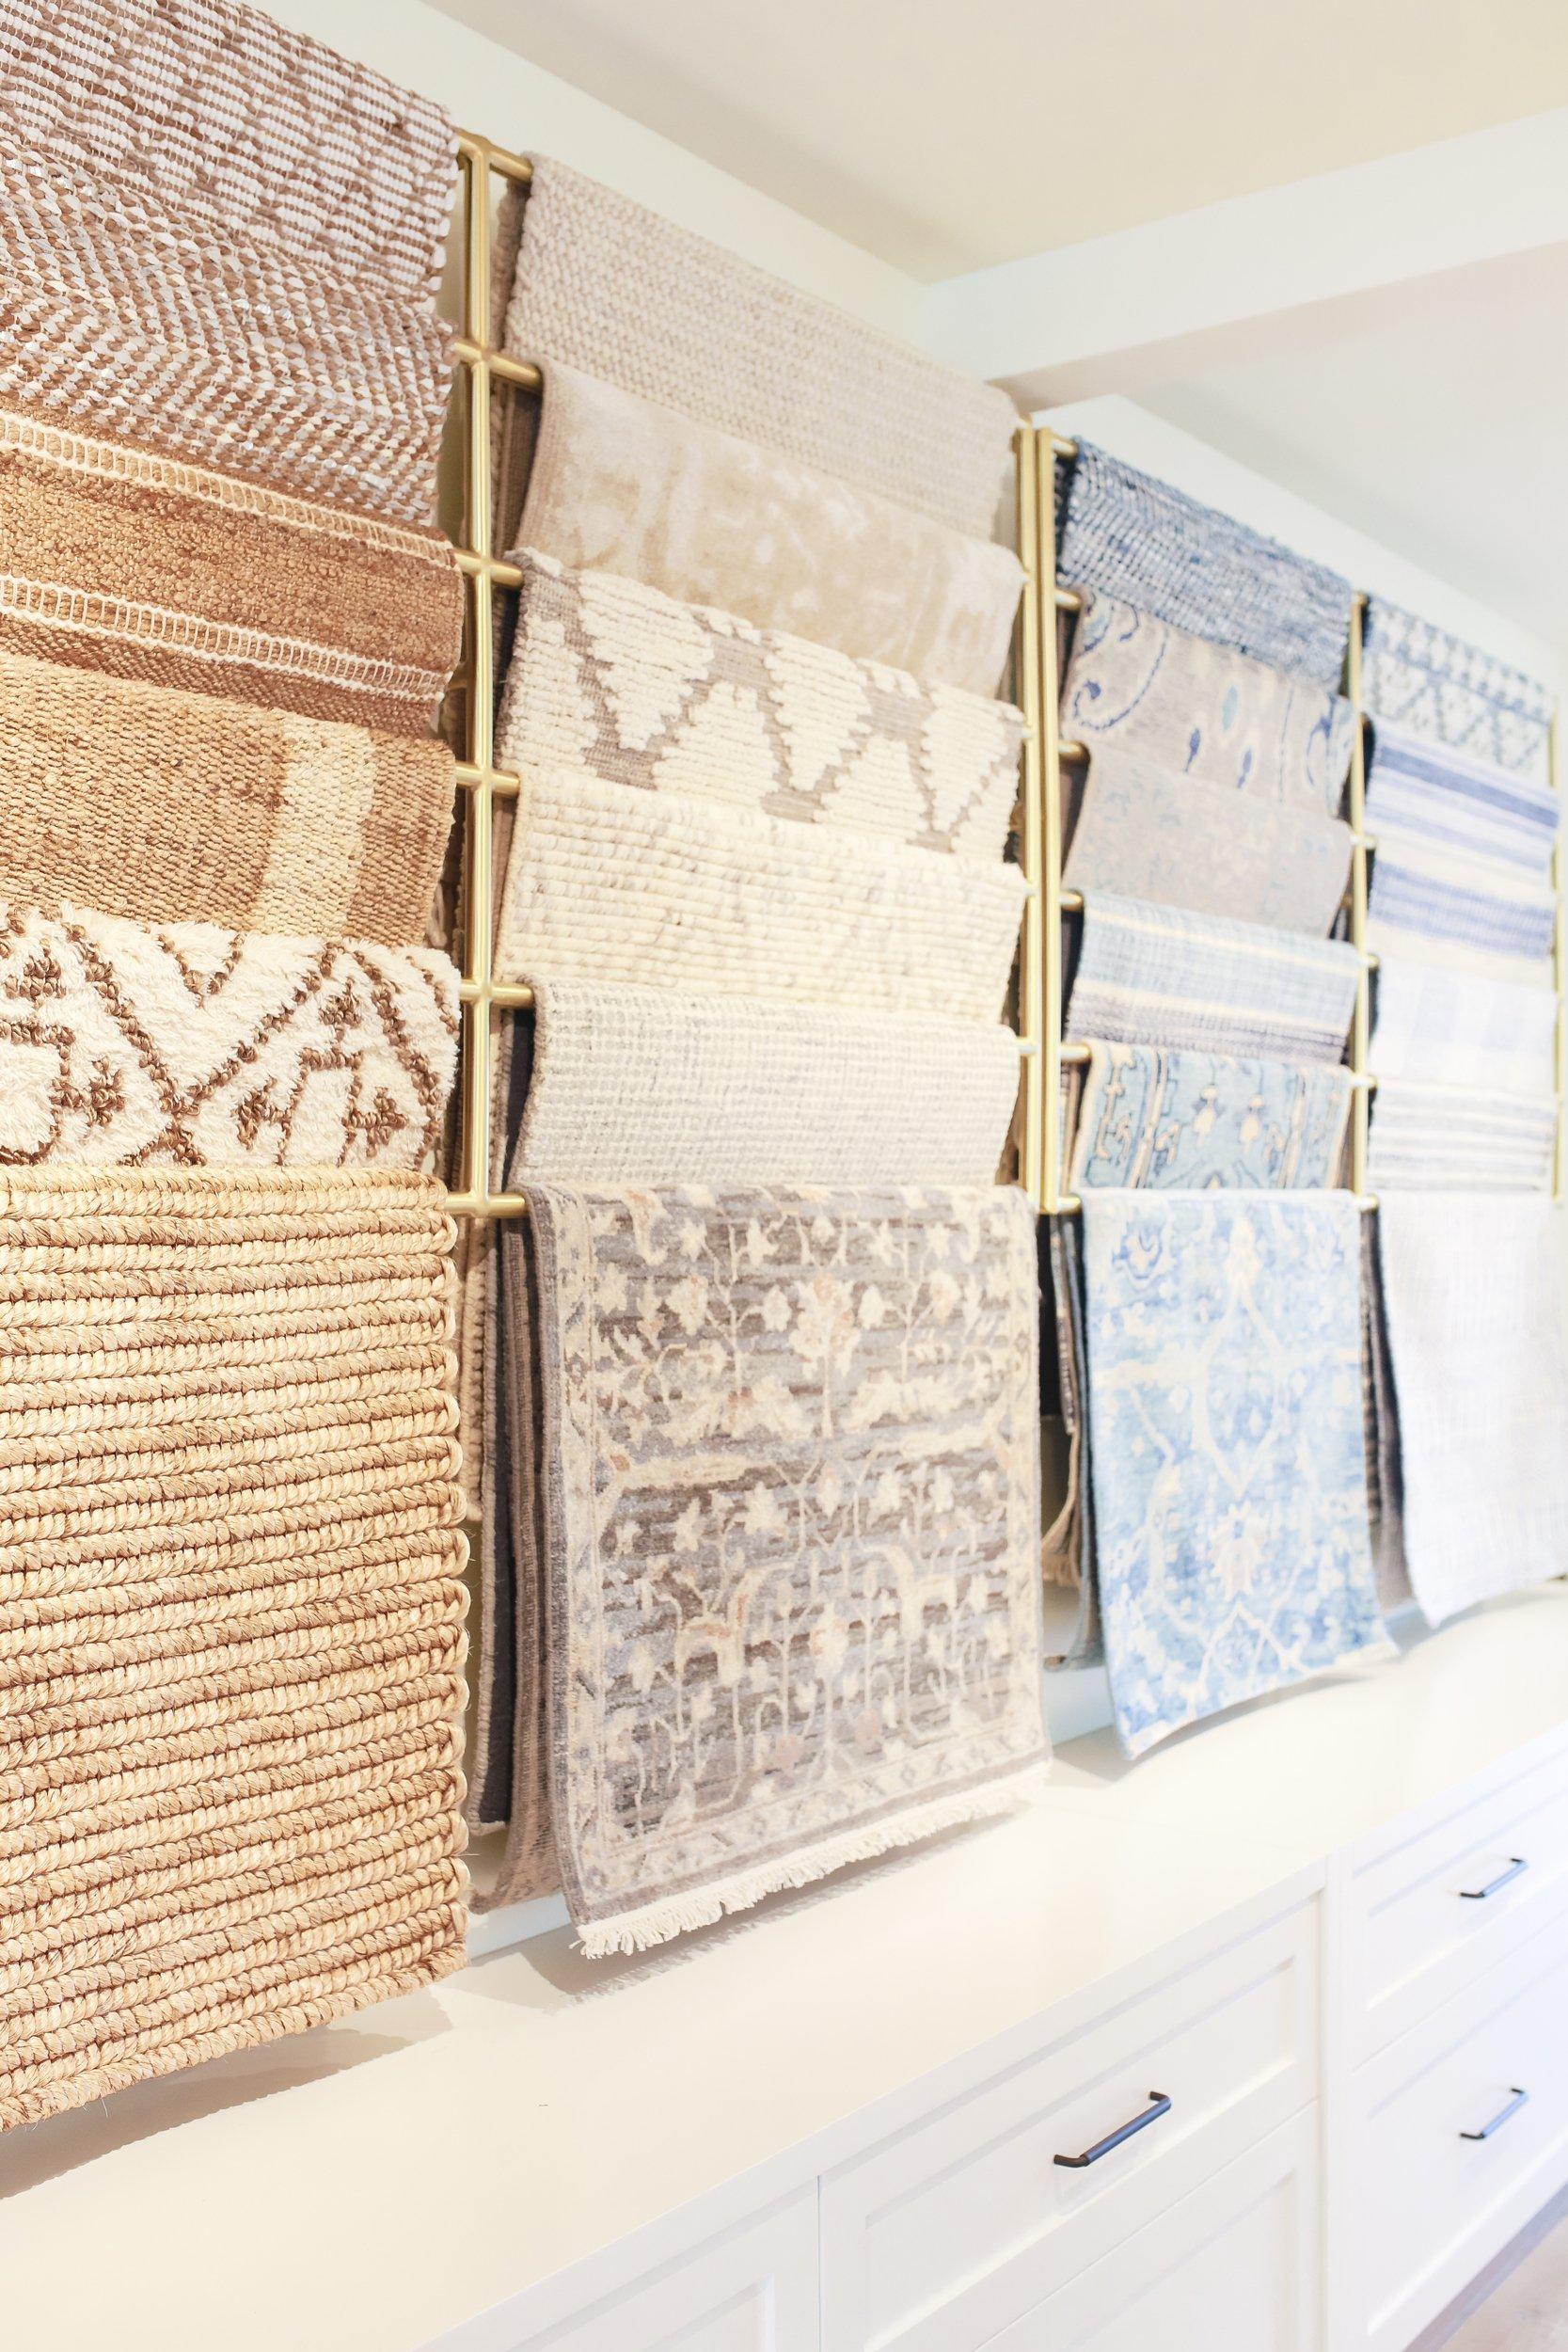 rugs on display